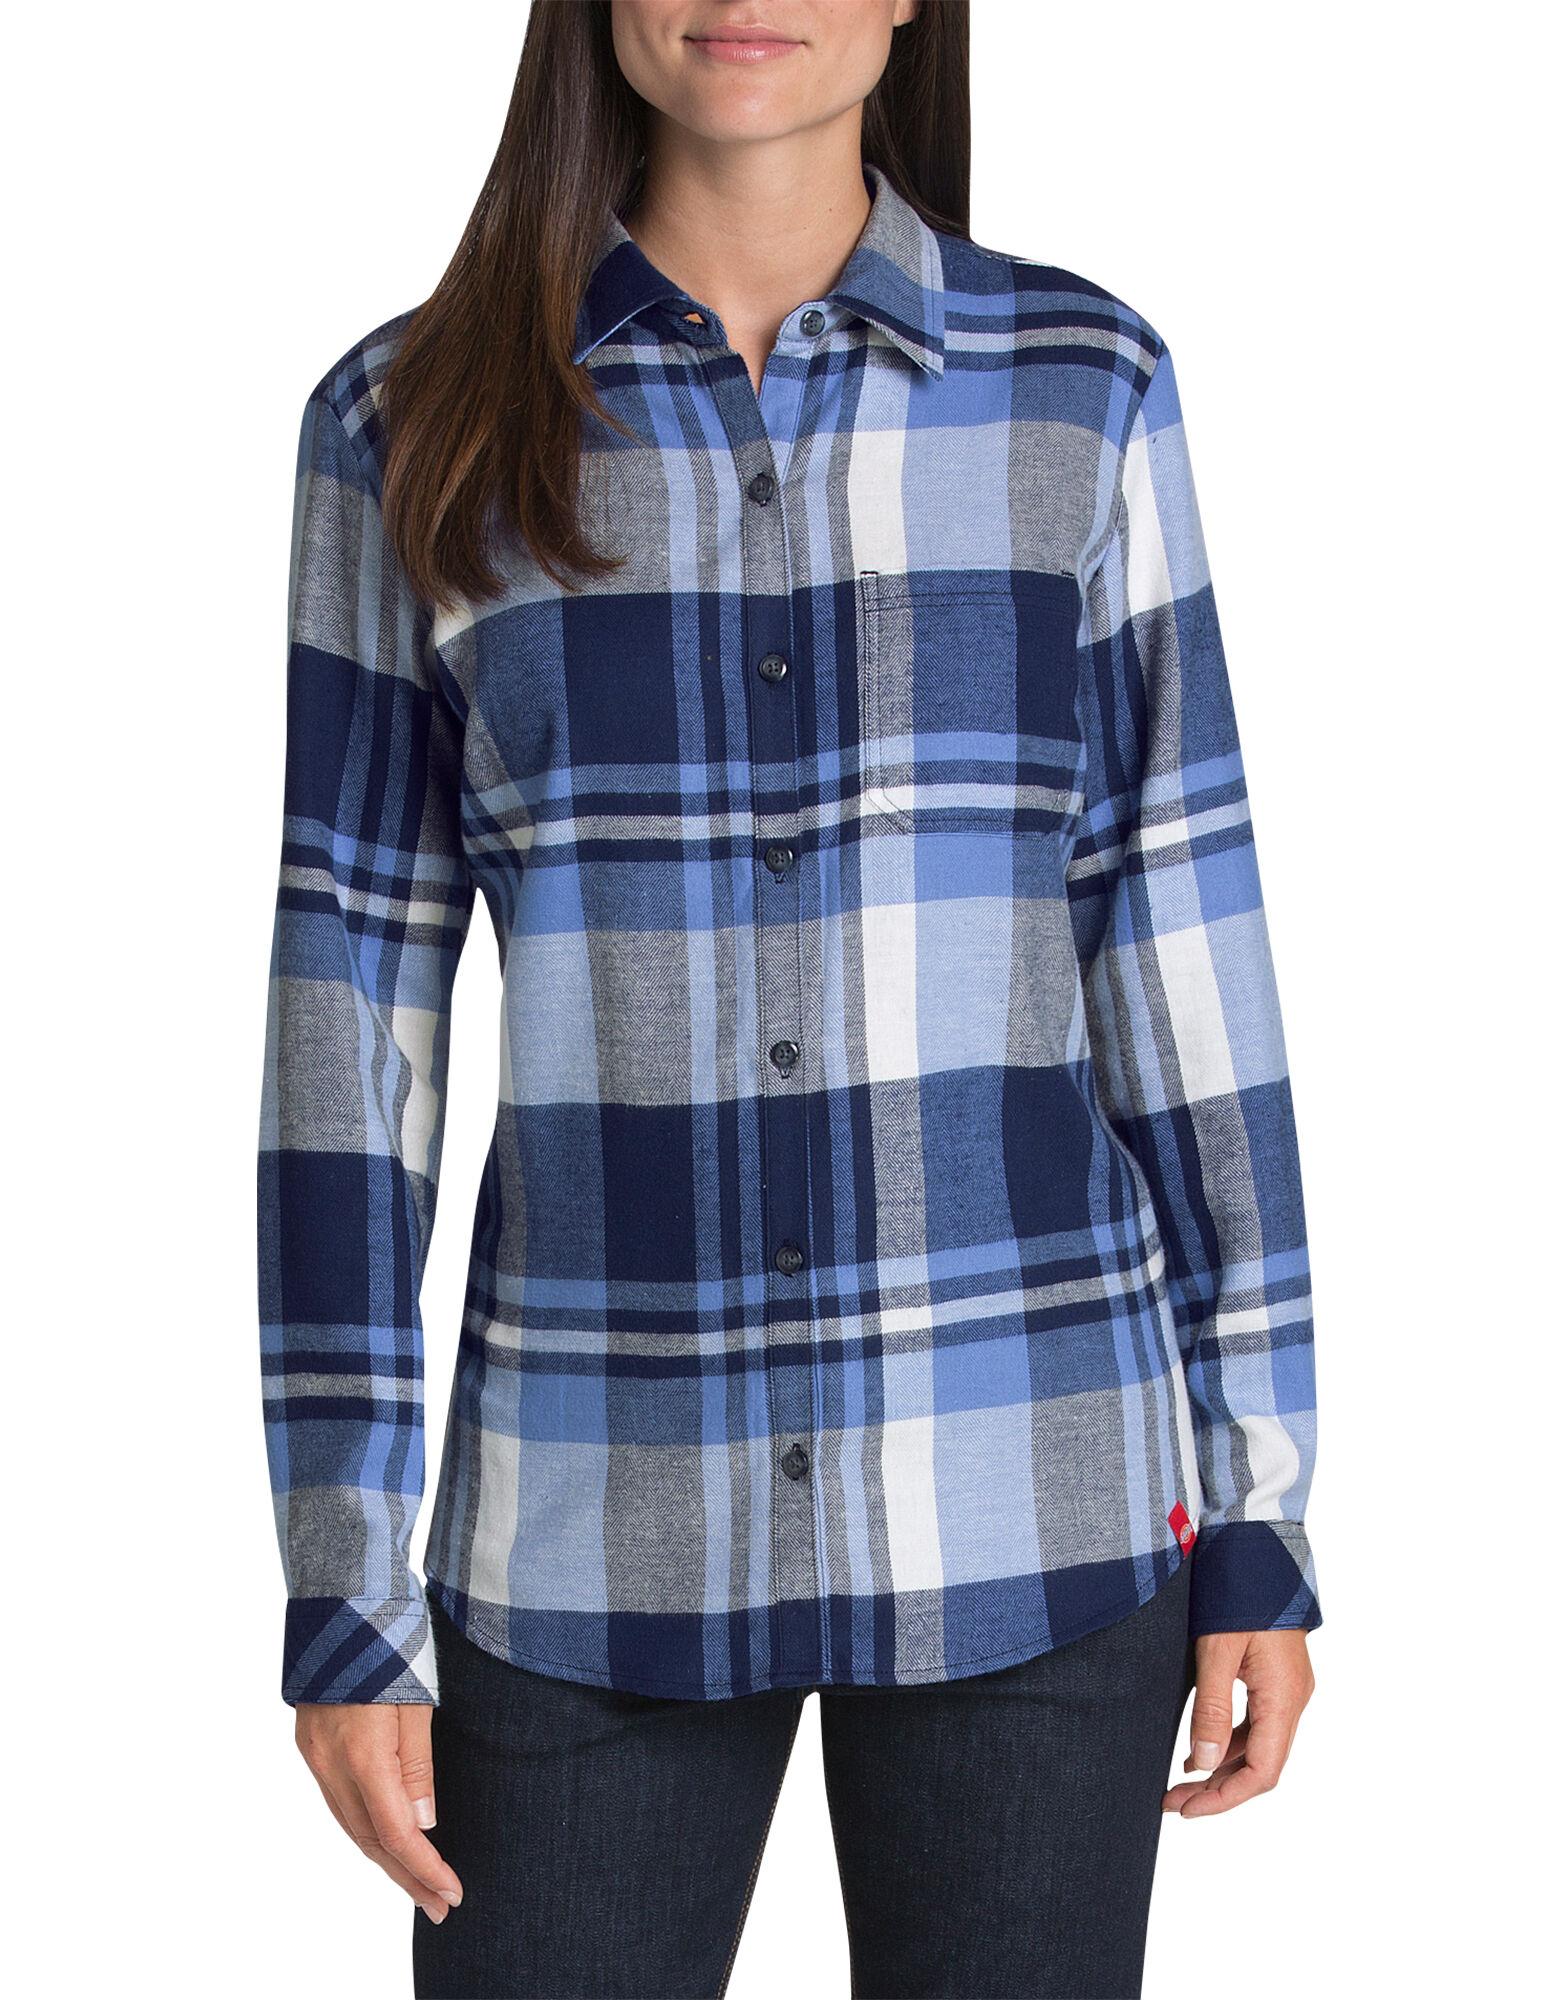 Women 39 s long sleeve plaid shirt dickies canada for Lightweight plaid shirt womens